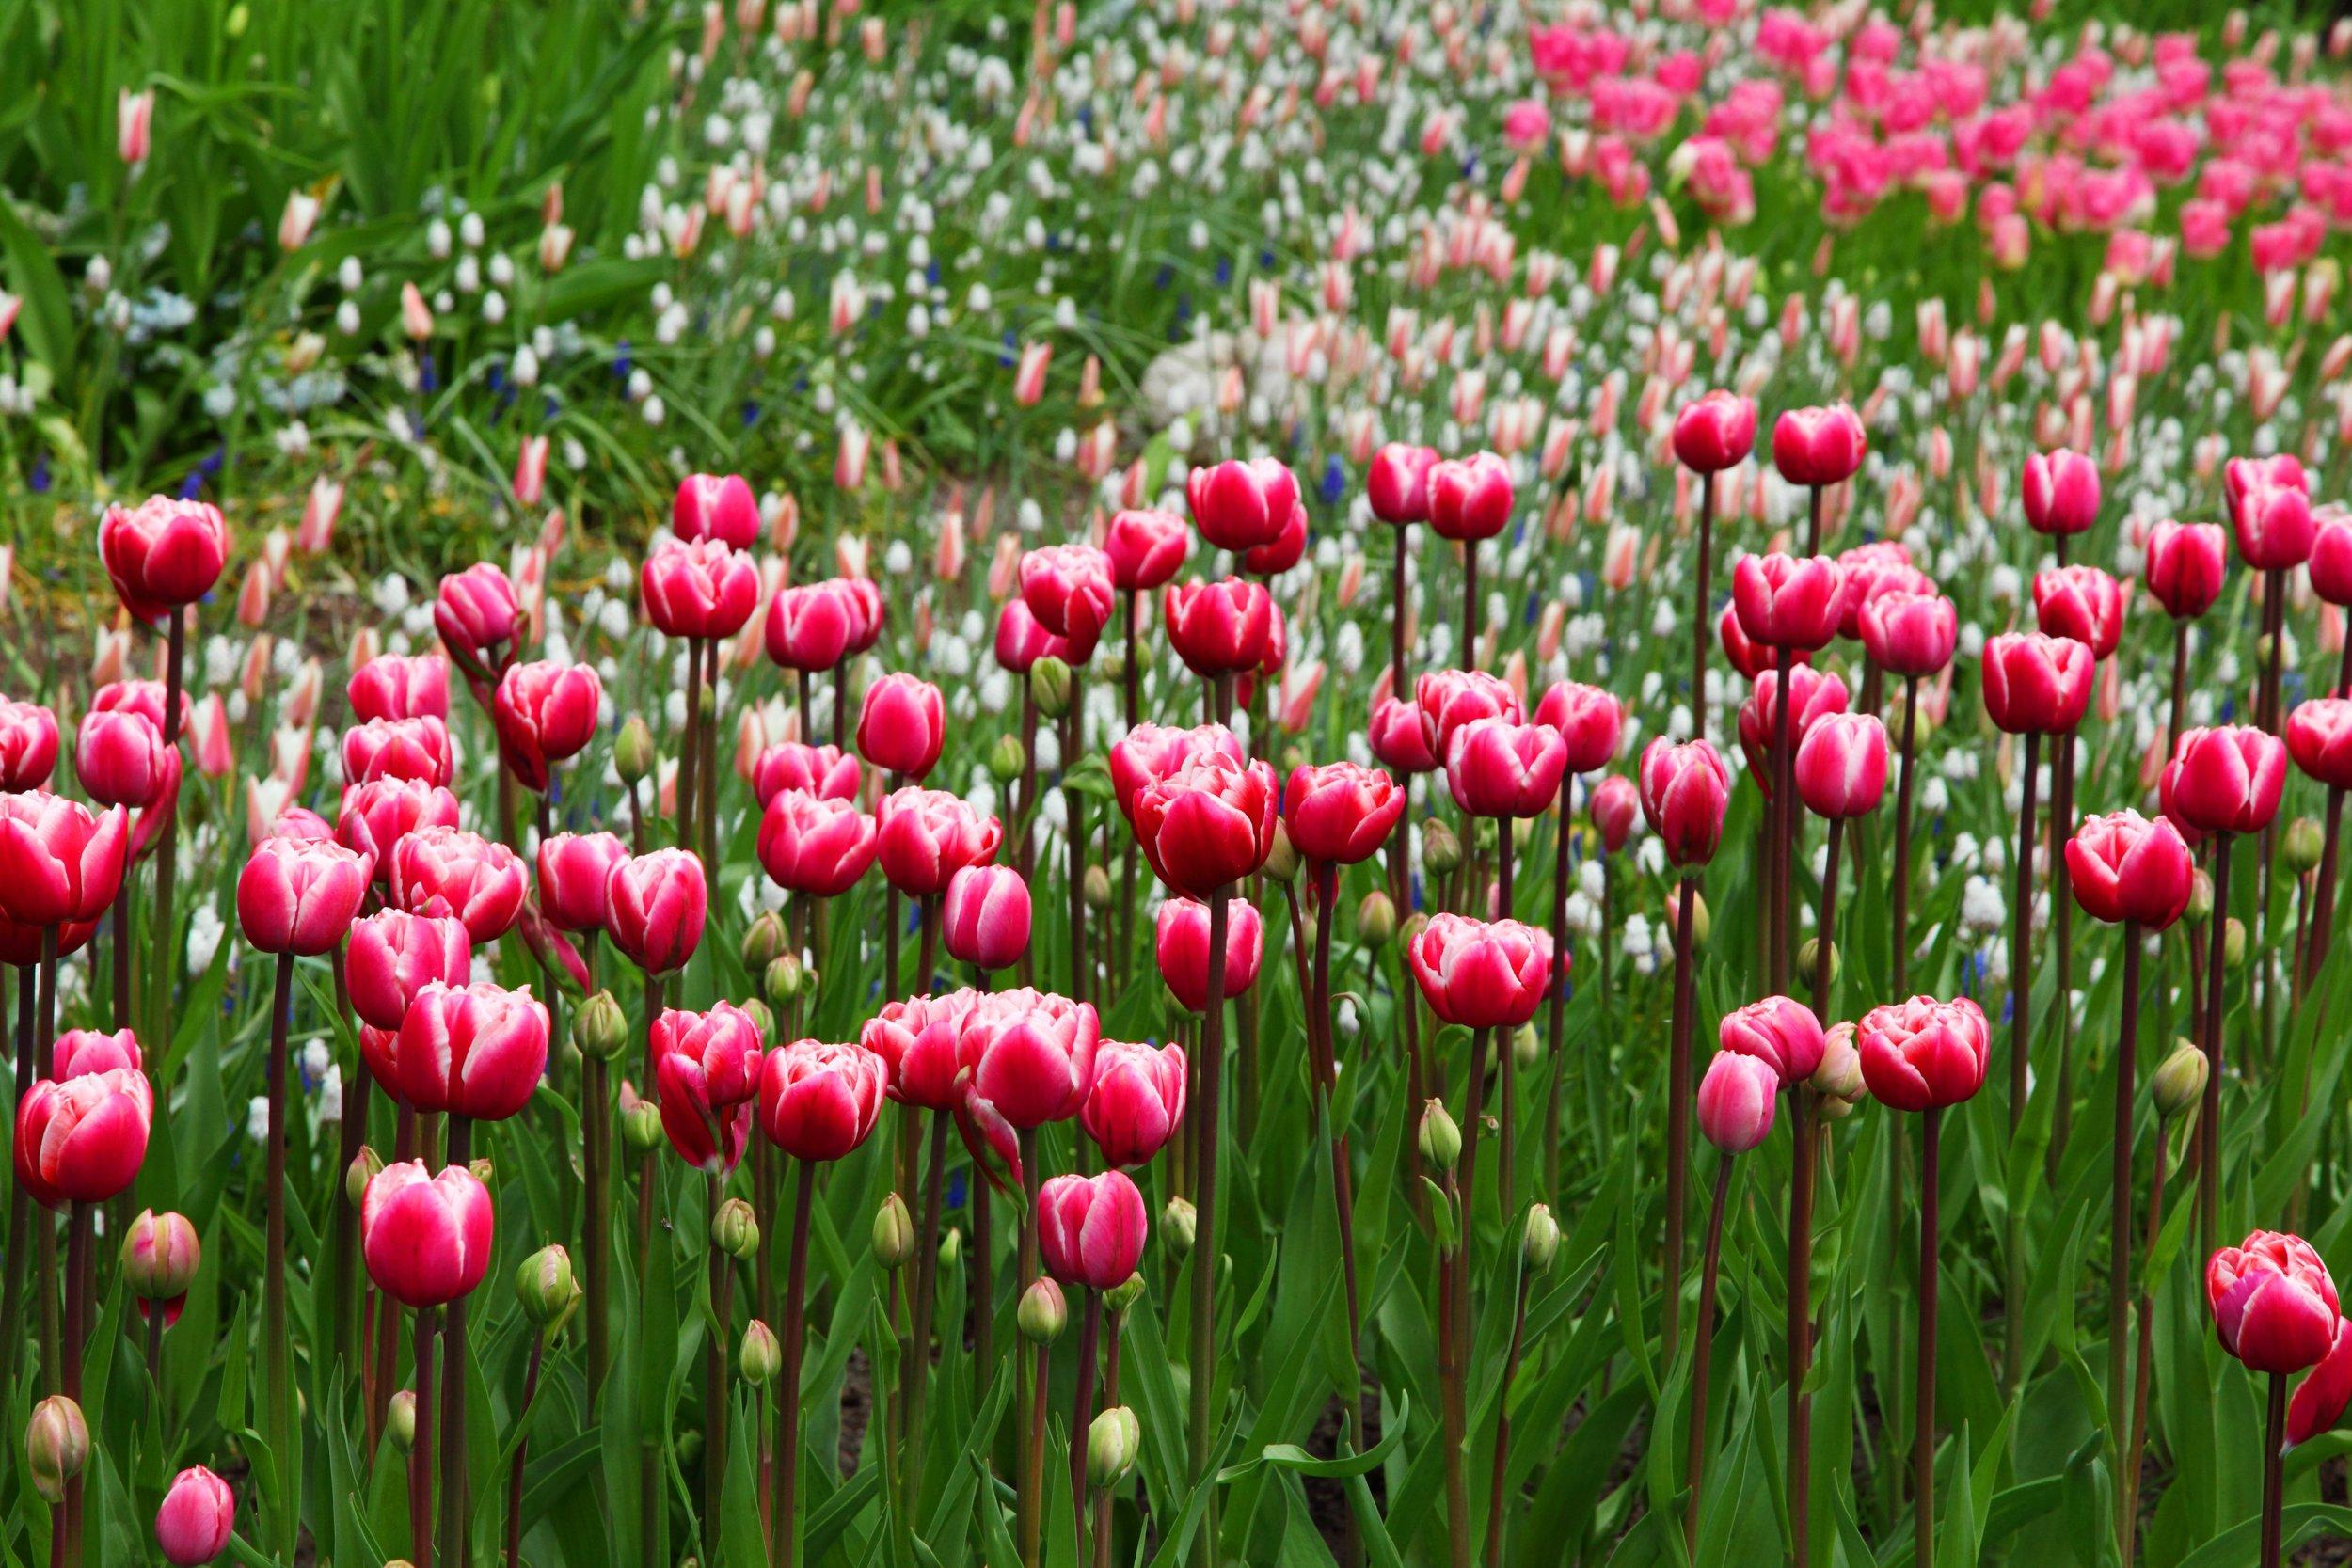 tulips-beautiful-2703.jpg